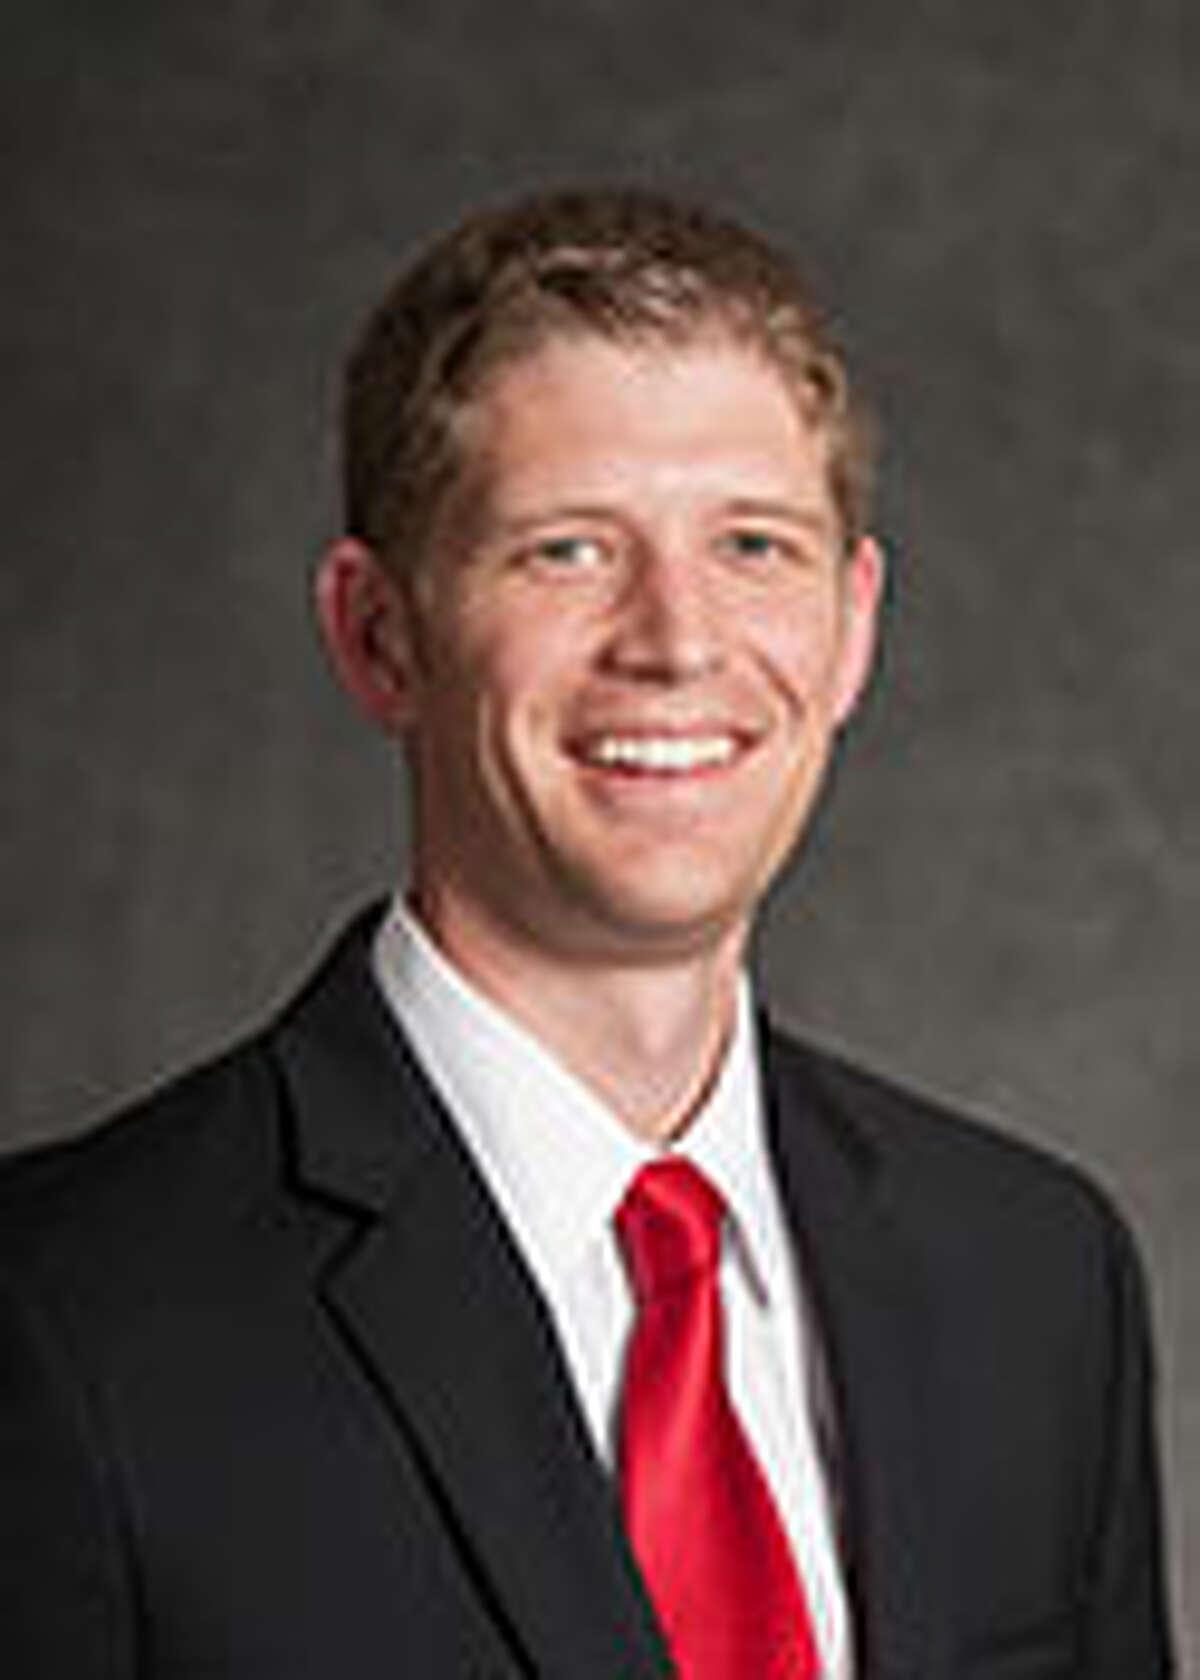 Rep. Matt Krause, R-Fort Worth (courtesy photo)